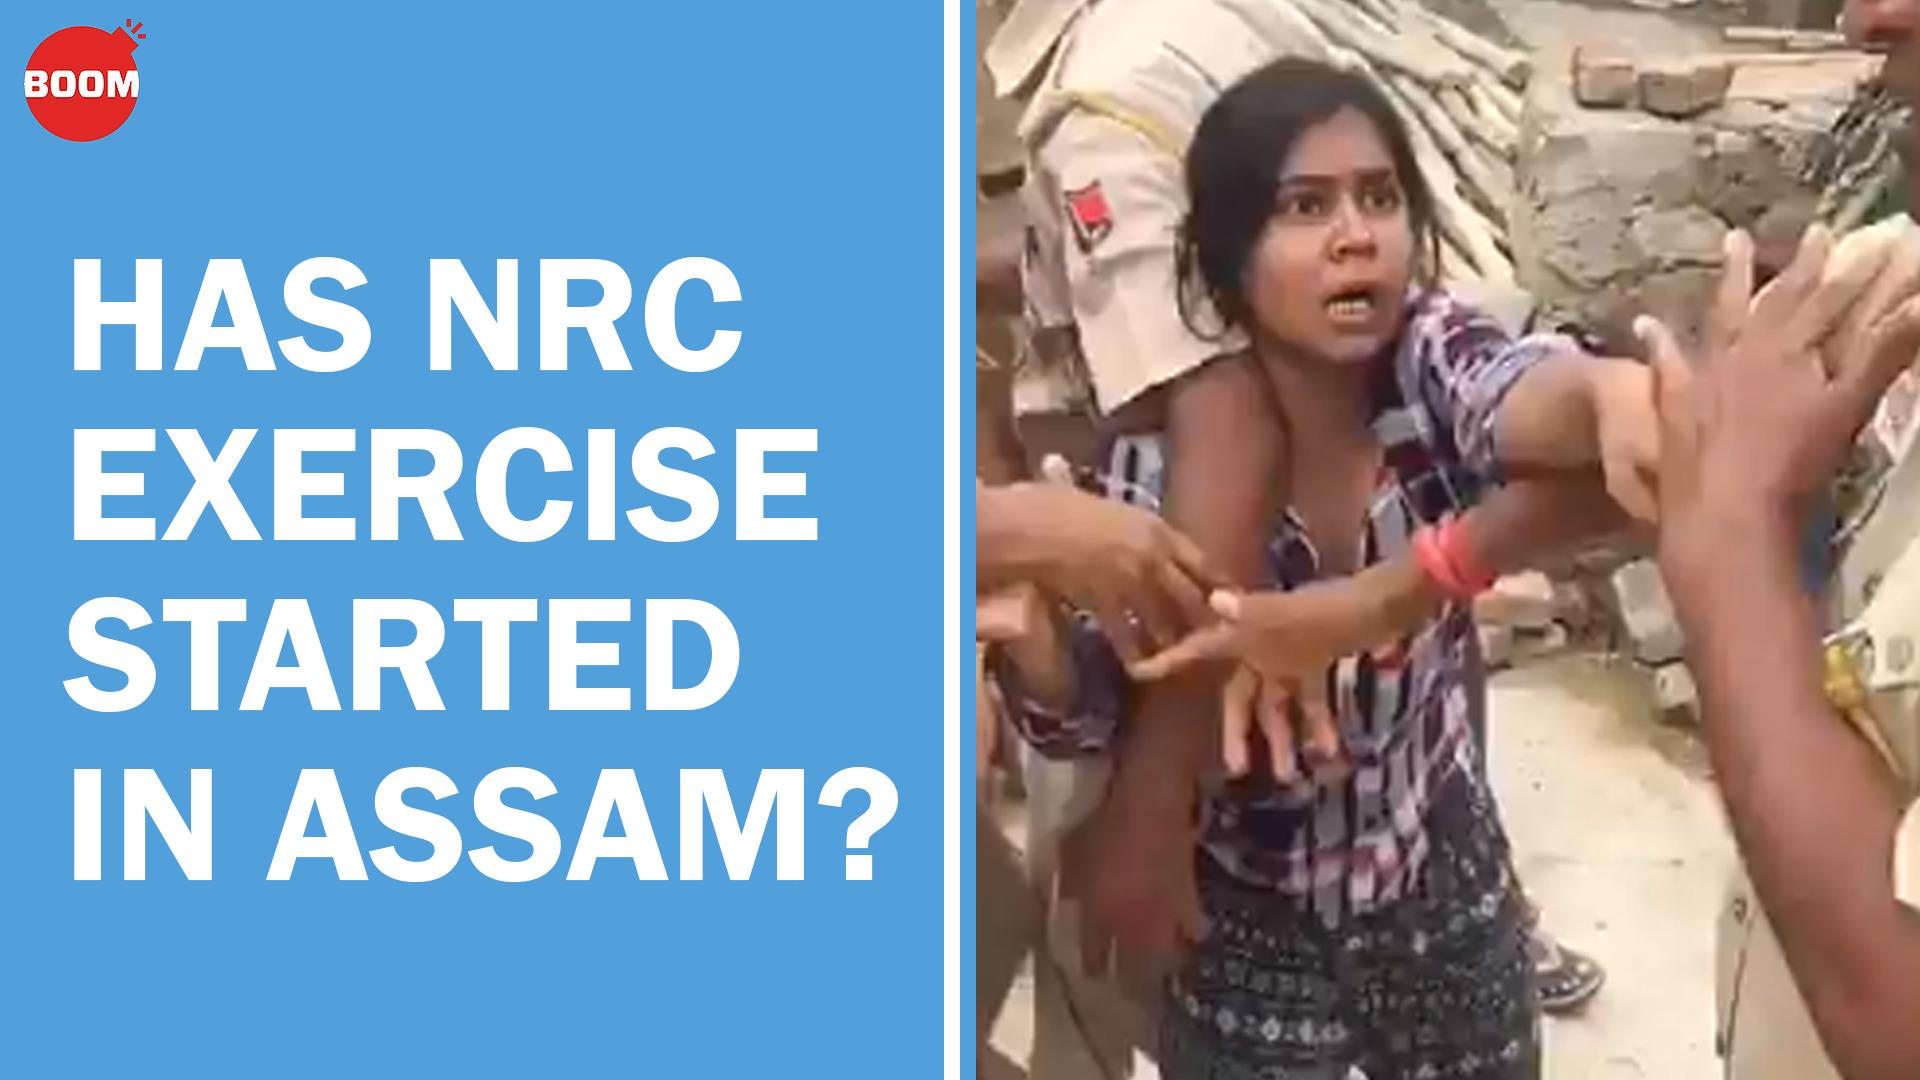 Has NRC exercise started in Assam?